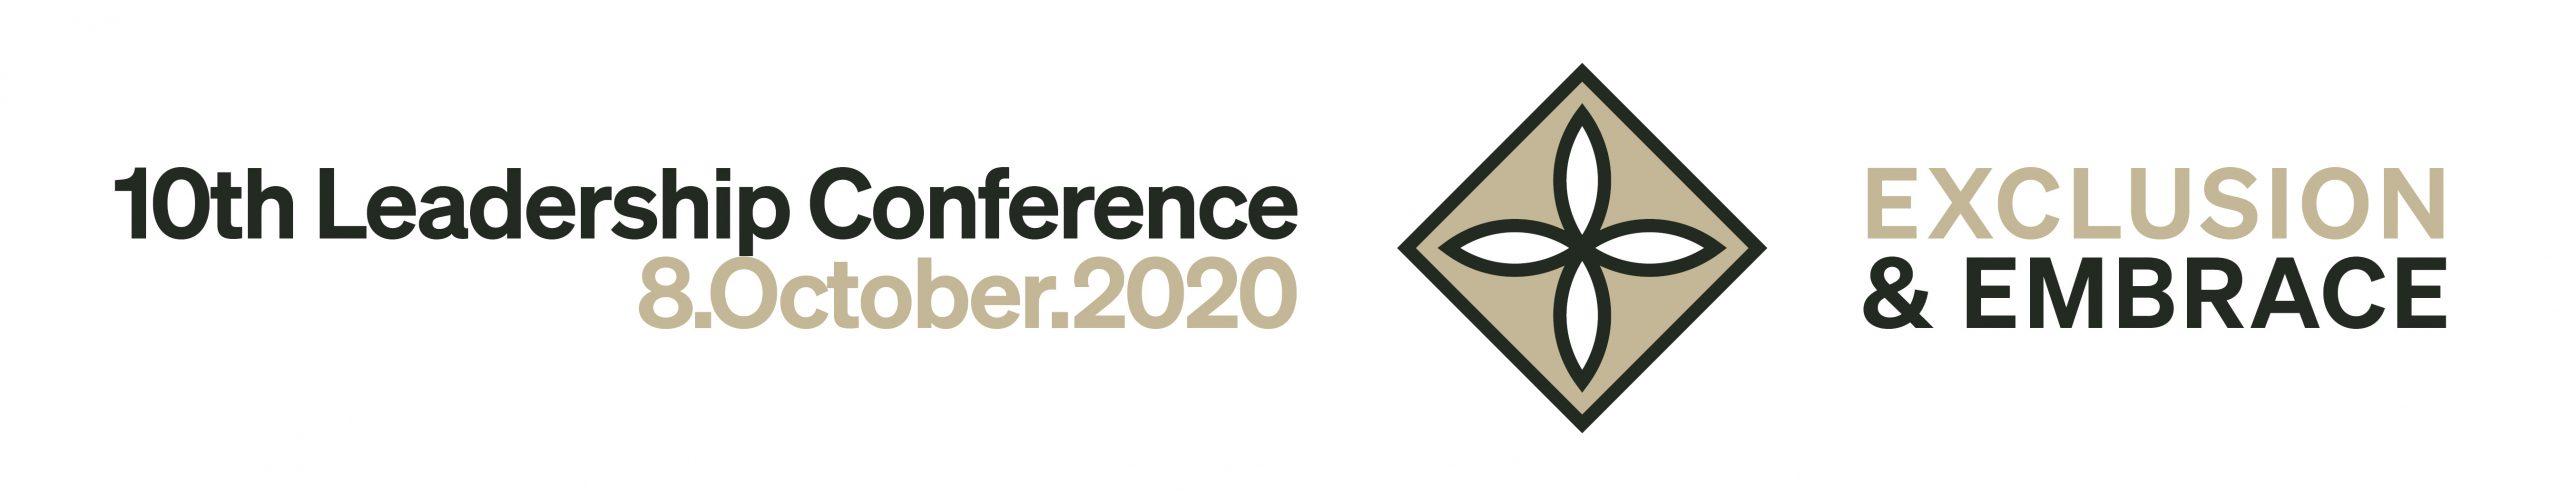 Christian Schools Canada 2020 Leadership Conference